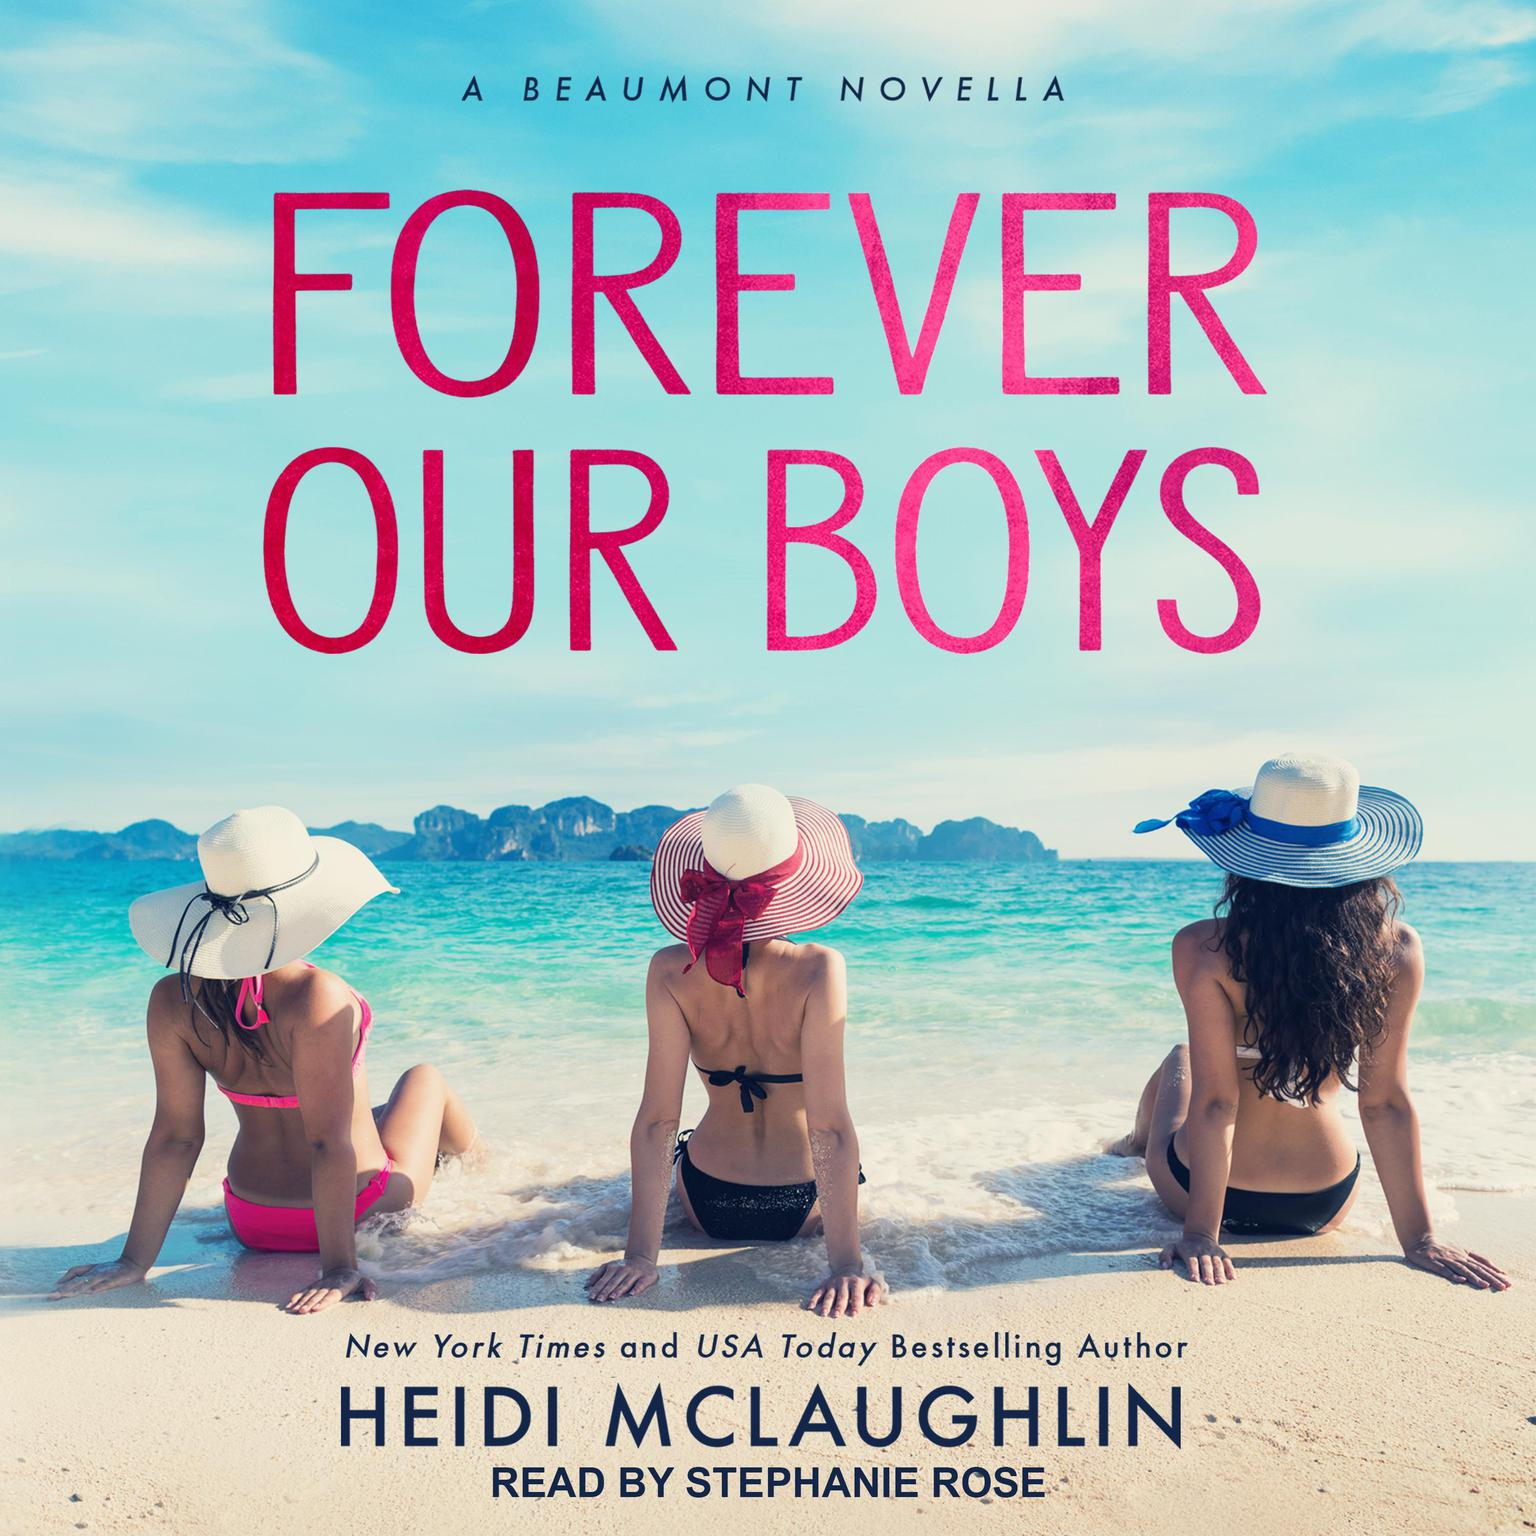 Forever Our Boys Audiobook, by Heidi McLaughlin